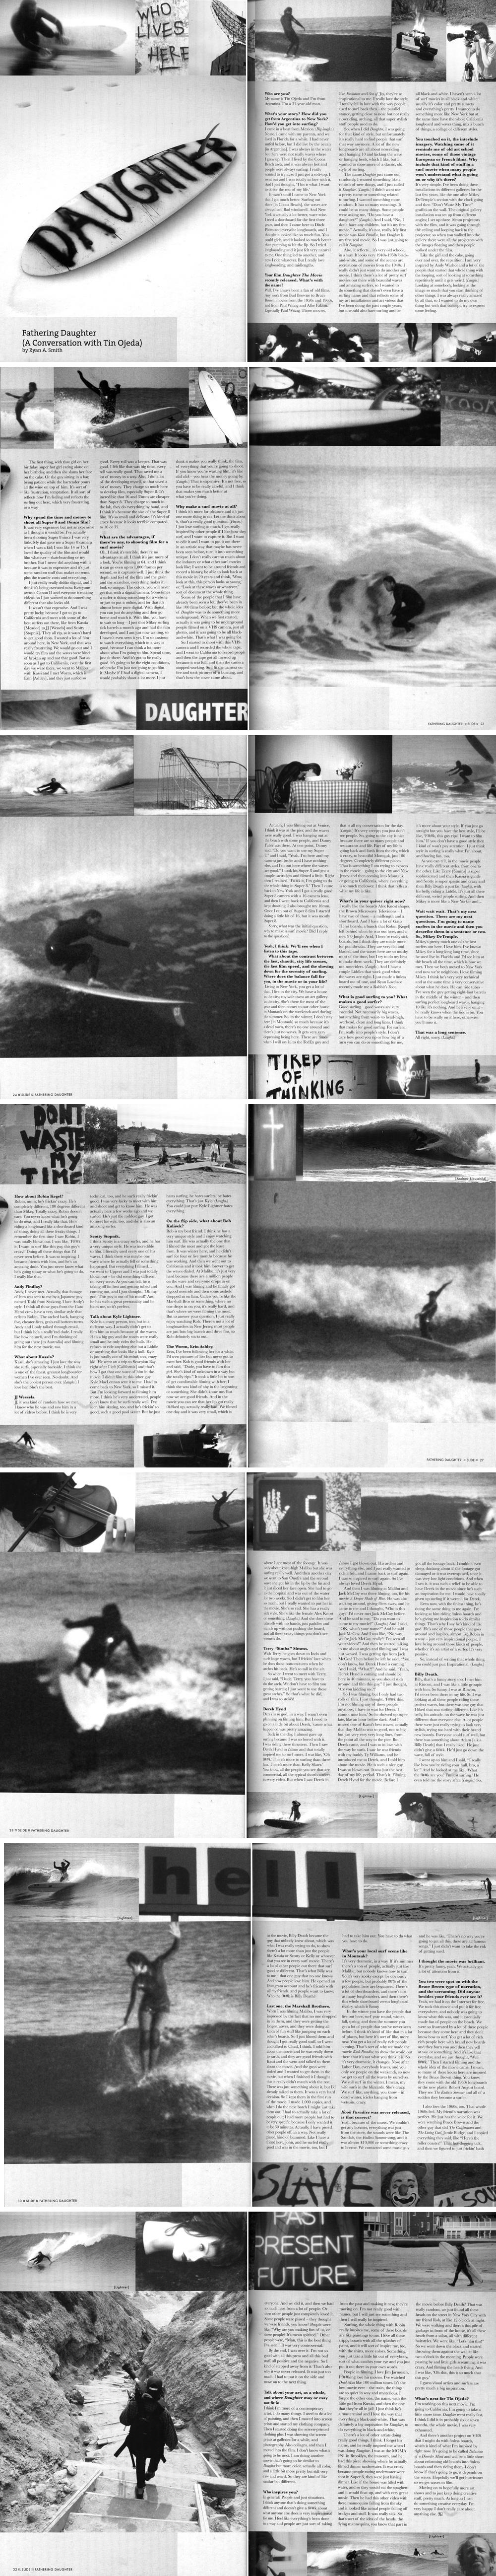 Slide Magazine (NZL) • Issue #47 • Daughter Film Editorial.